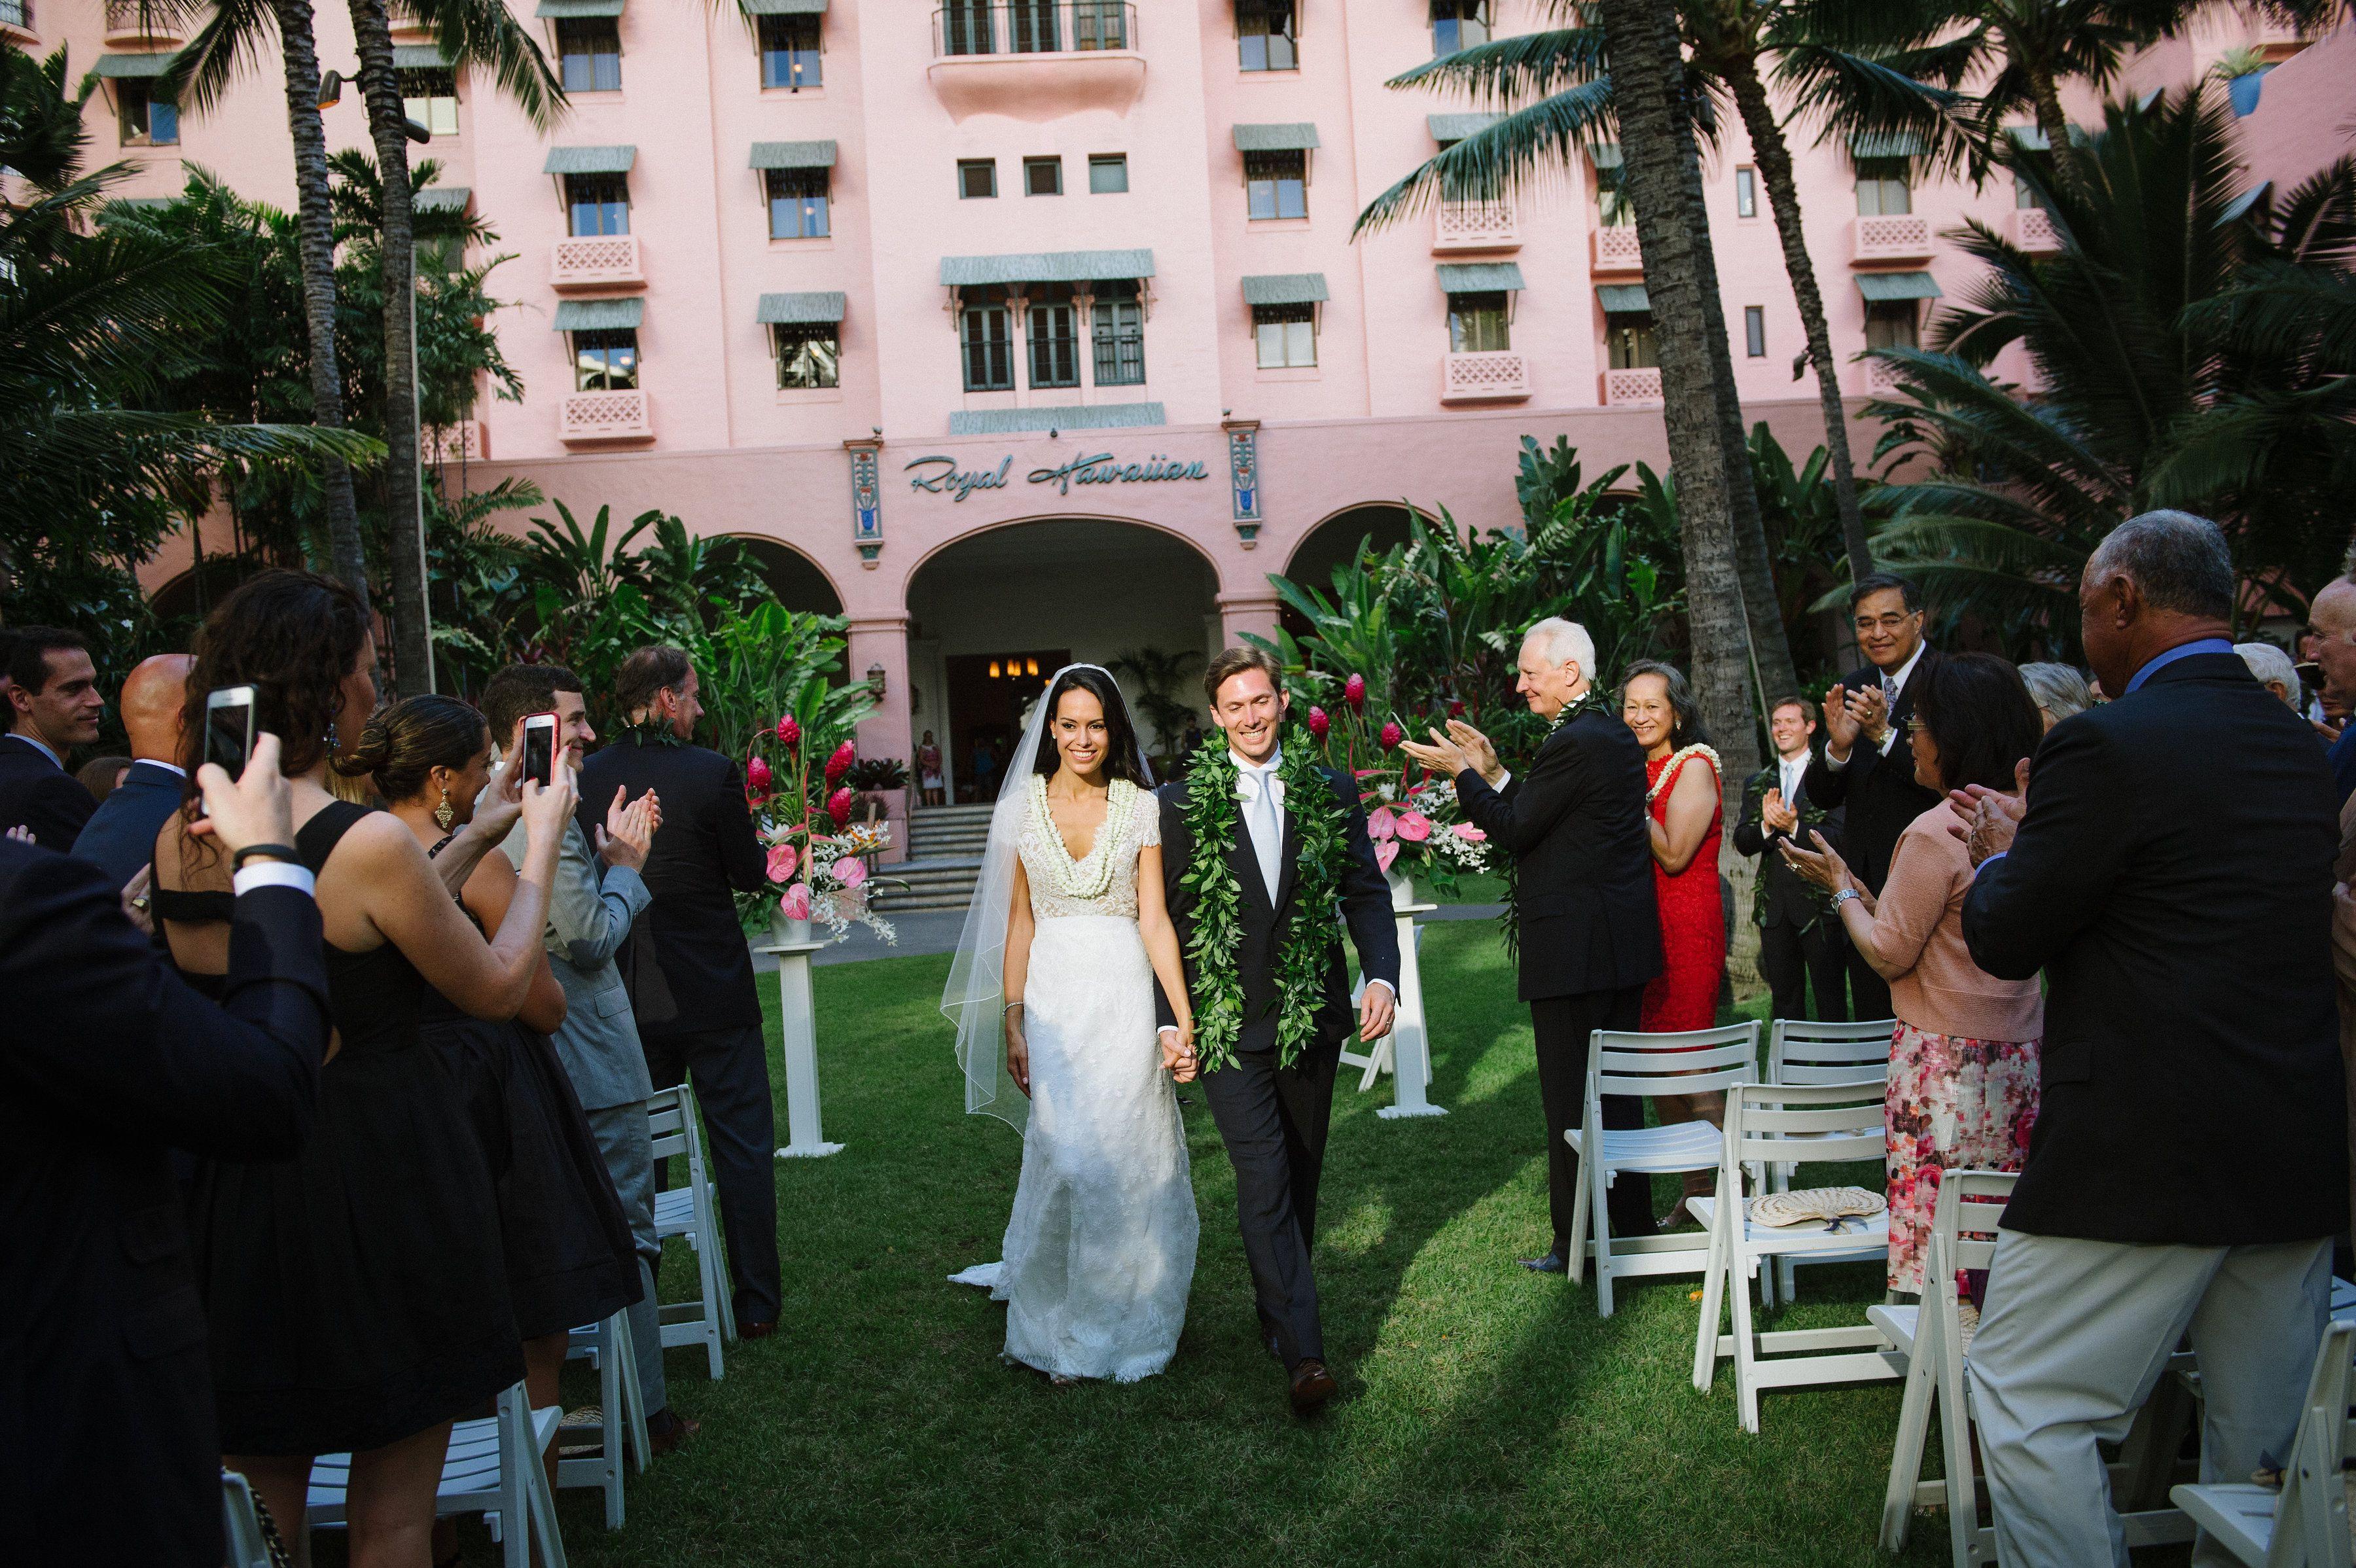 Hawaii Wedding Royal Hawaiian Ceremony Bouquet Lei Flowers Watanabe Fl Photography Derek Wong